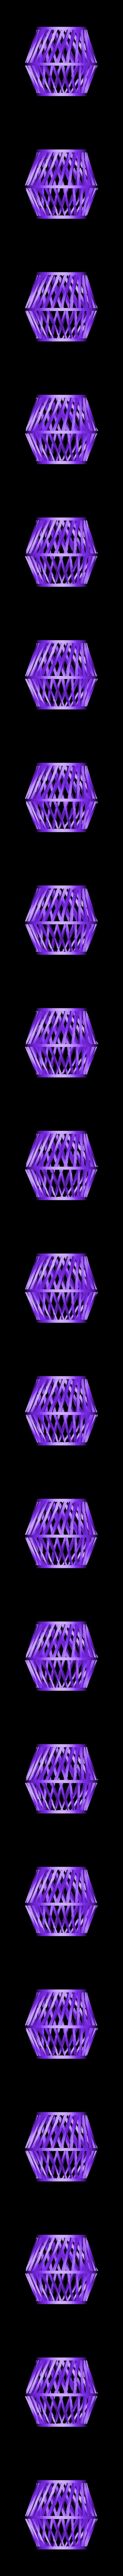 L11.STL Download free STL file Lampshade / or / vase • Design to 3D print, boyery